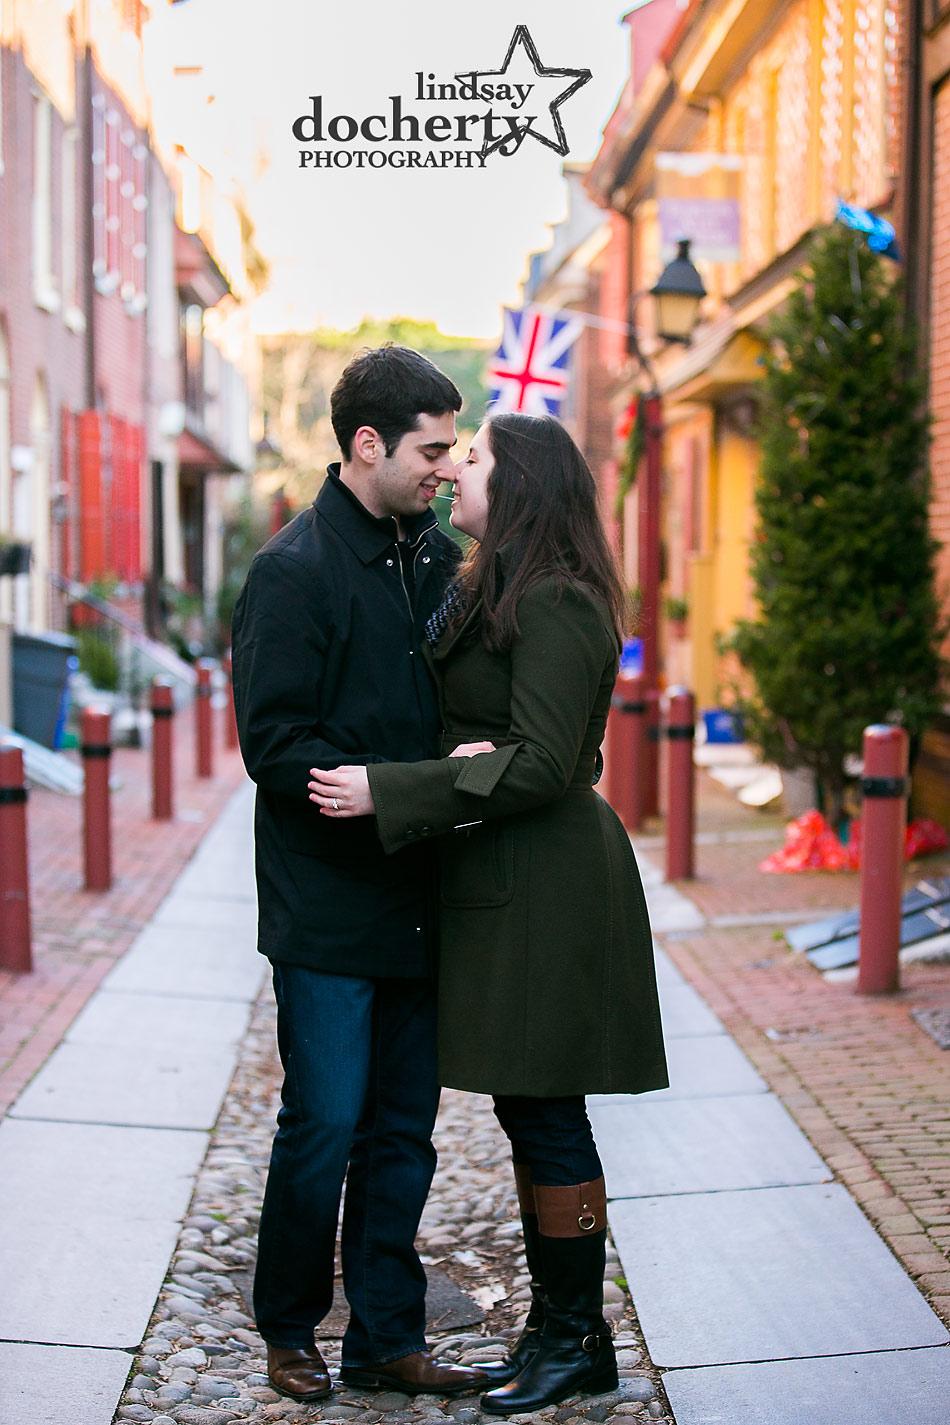 Elfreths-Alley-engagement-session-in-Philadelphia